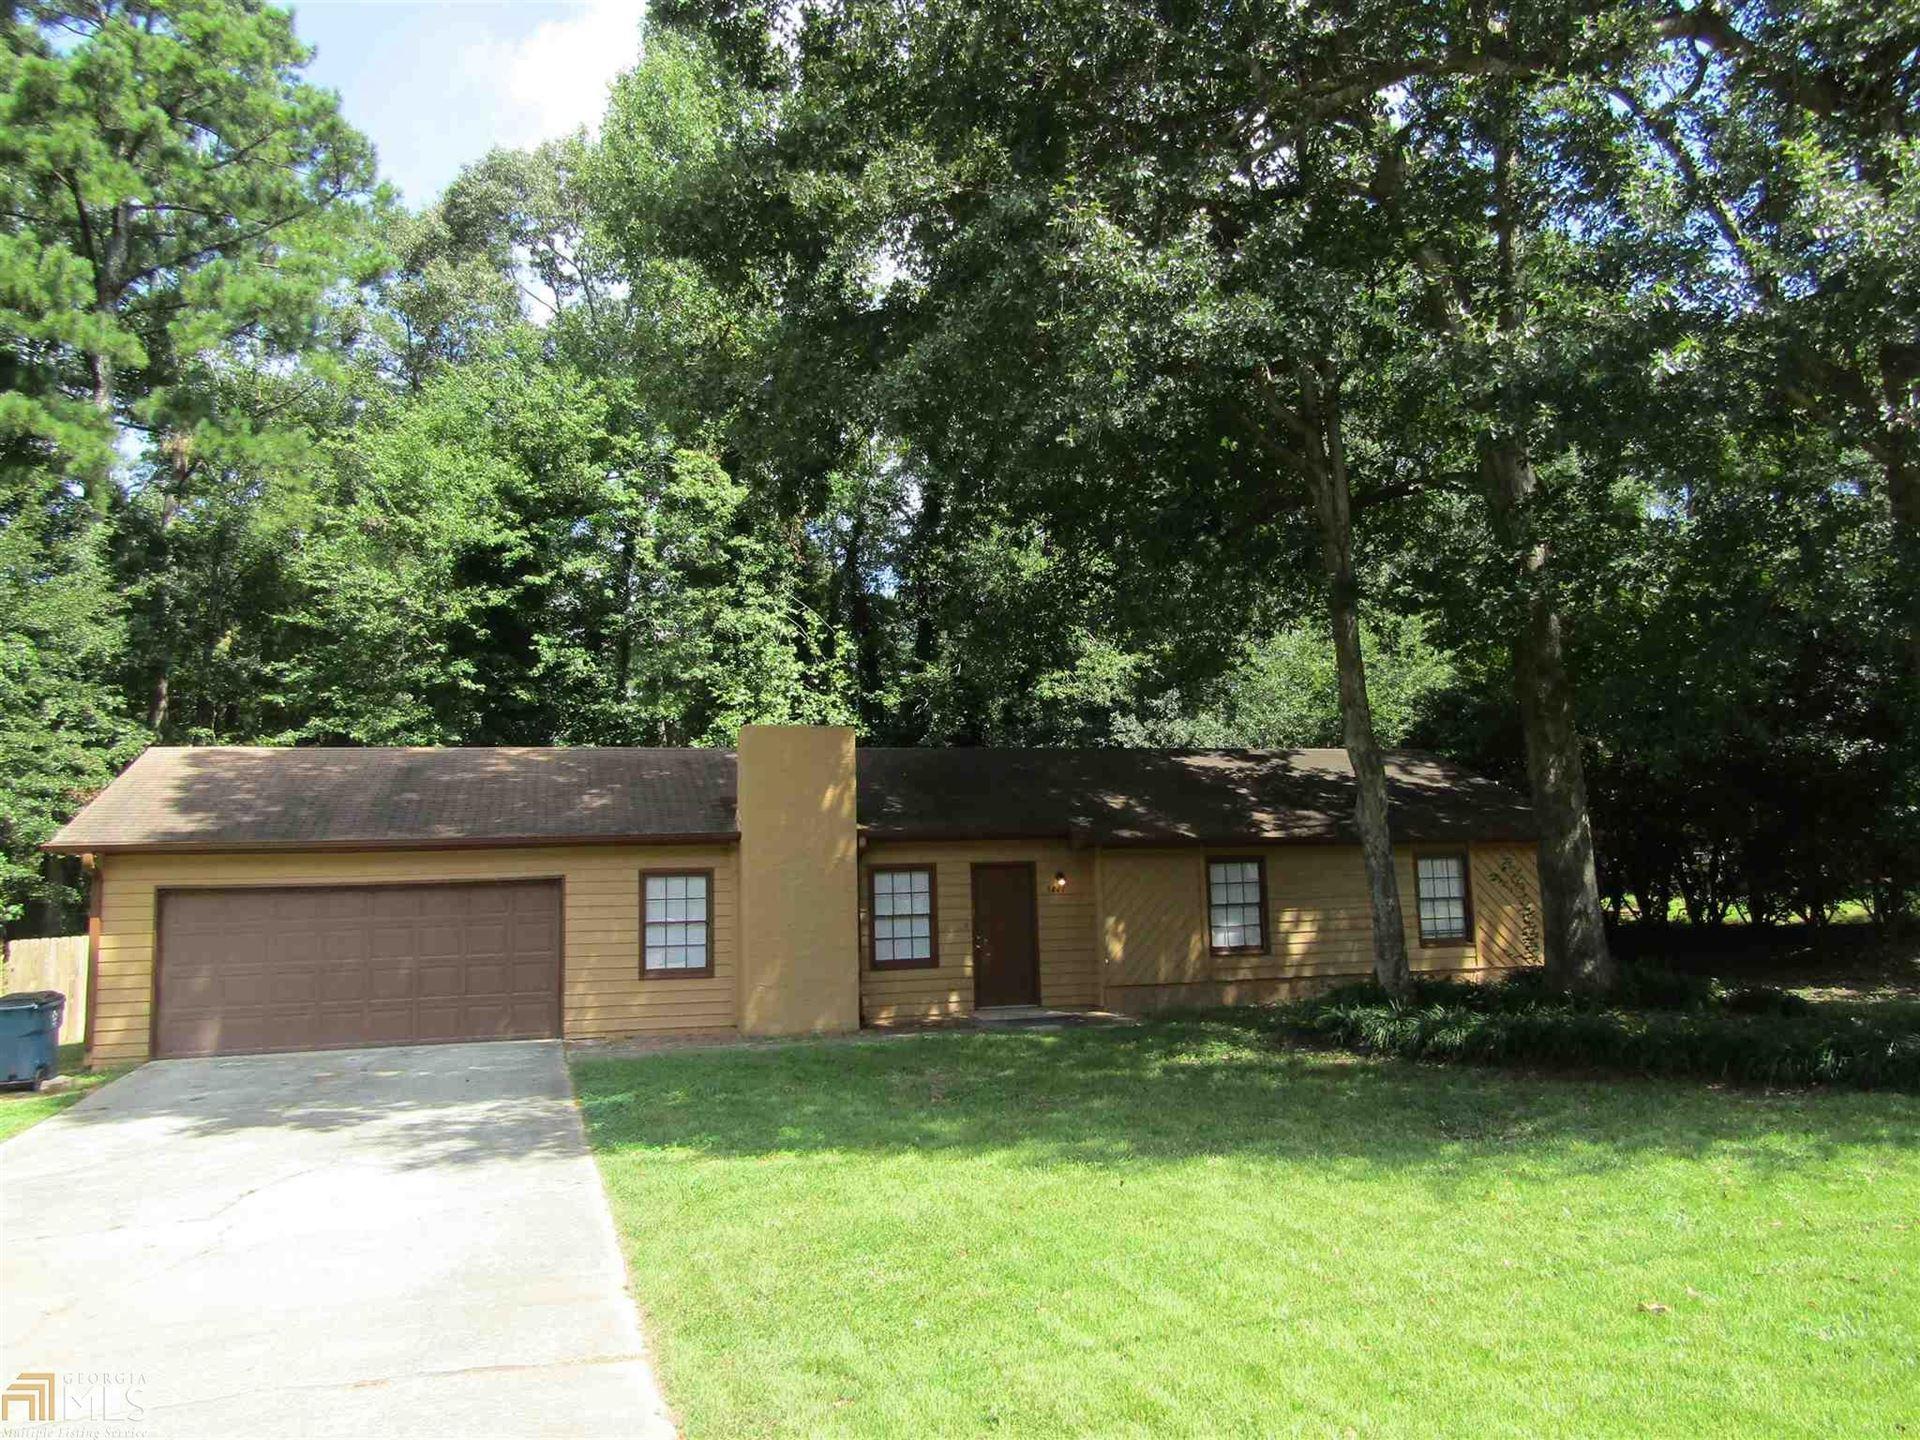 3441 Creekwood Dr, Conyers, GA 30094 - #: 8852694